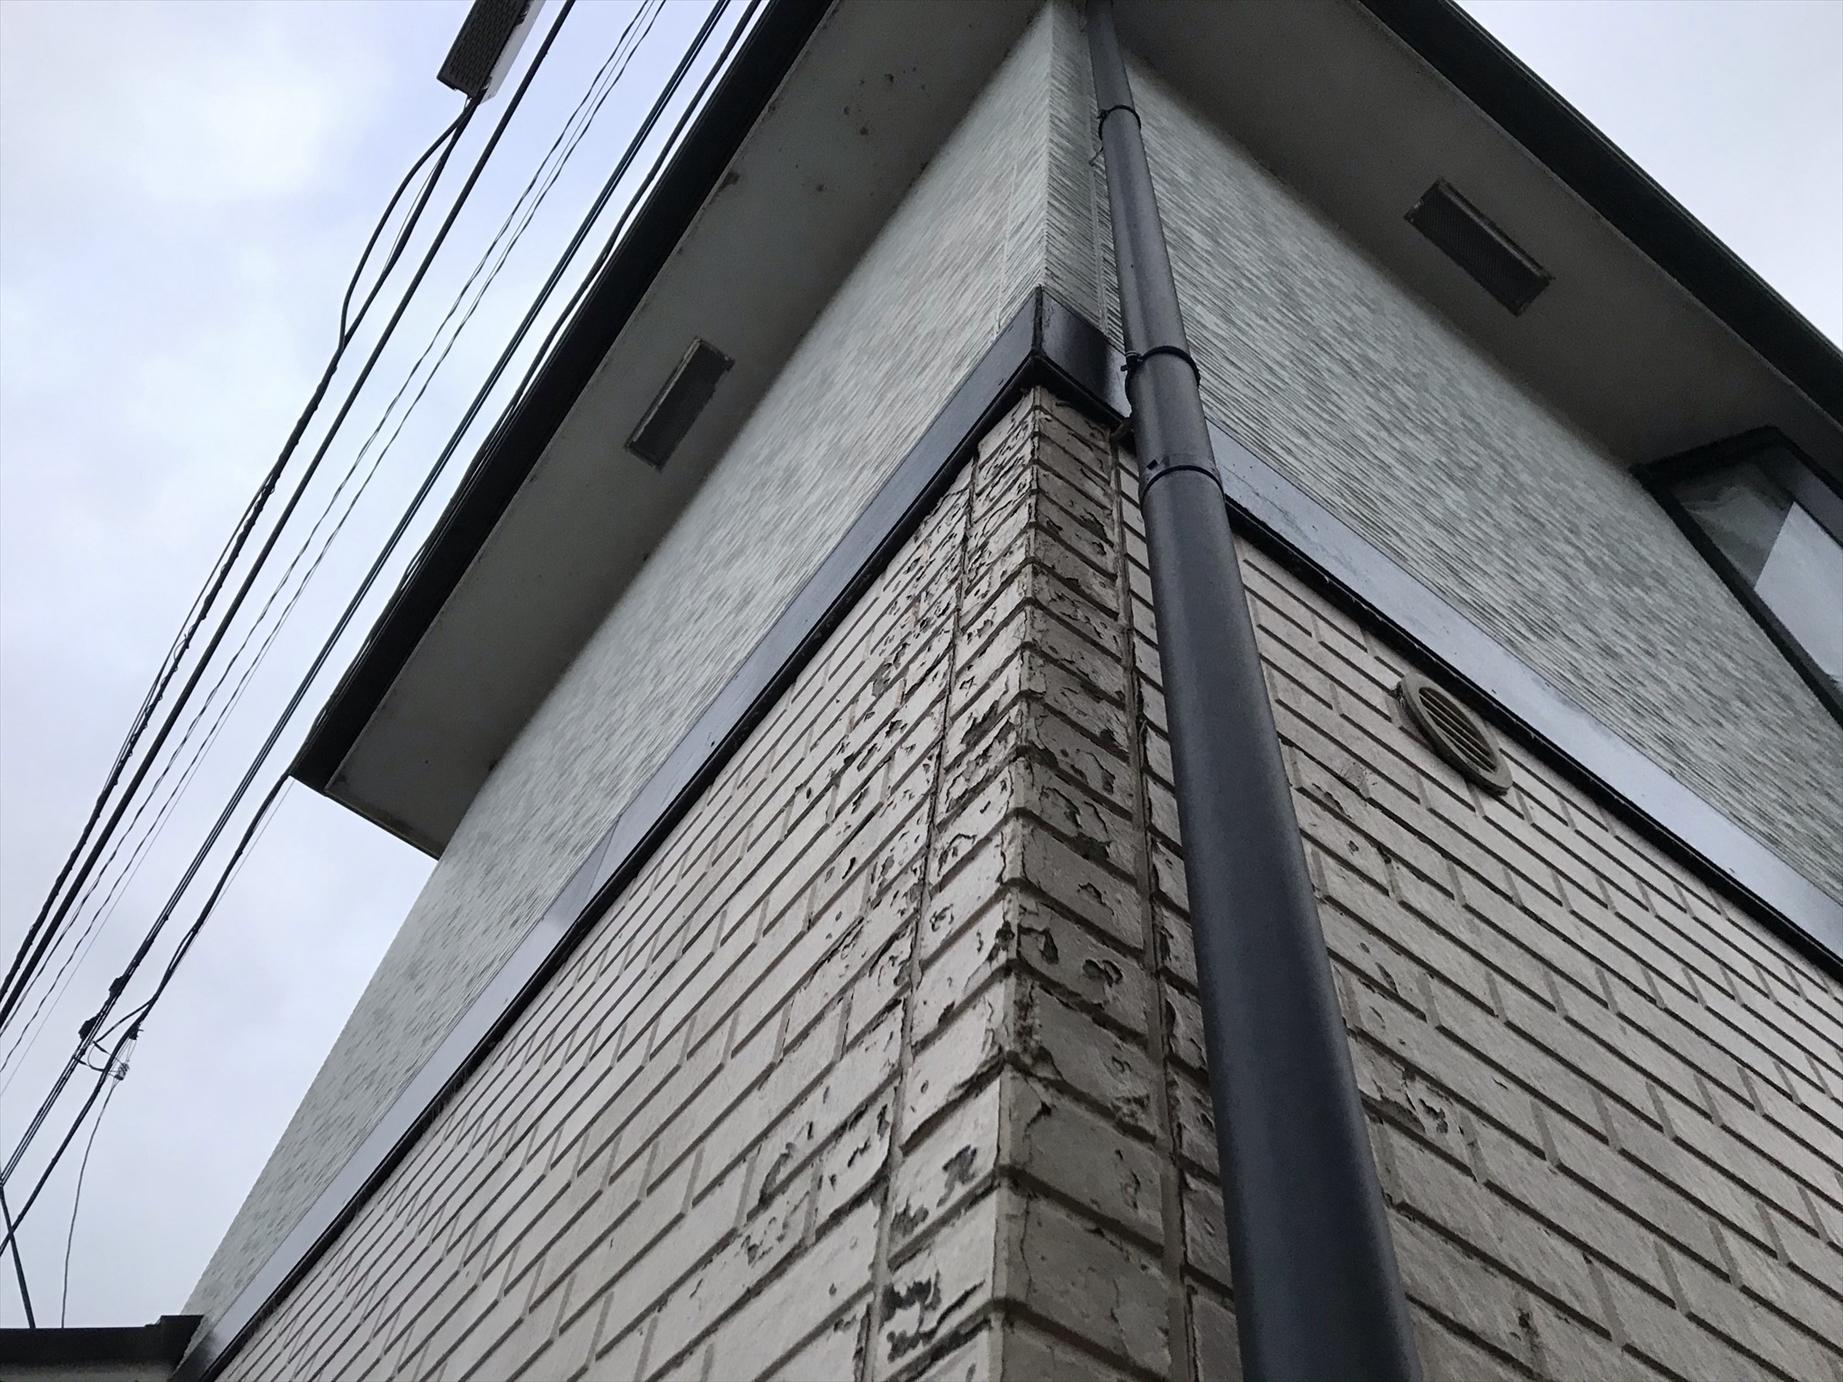 伊奈町築25年賃貸一軒家点検時の北西角サイディング外壁